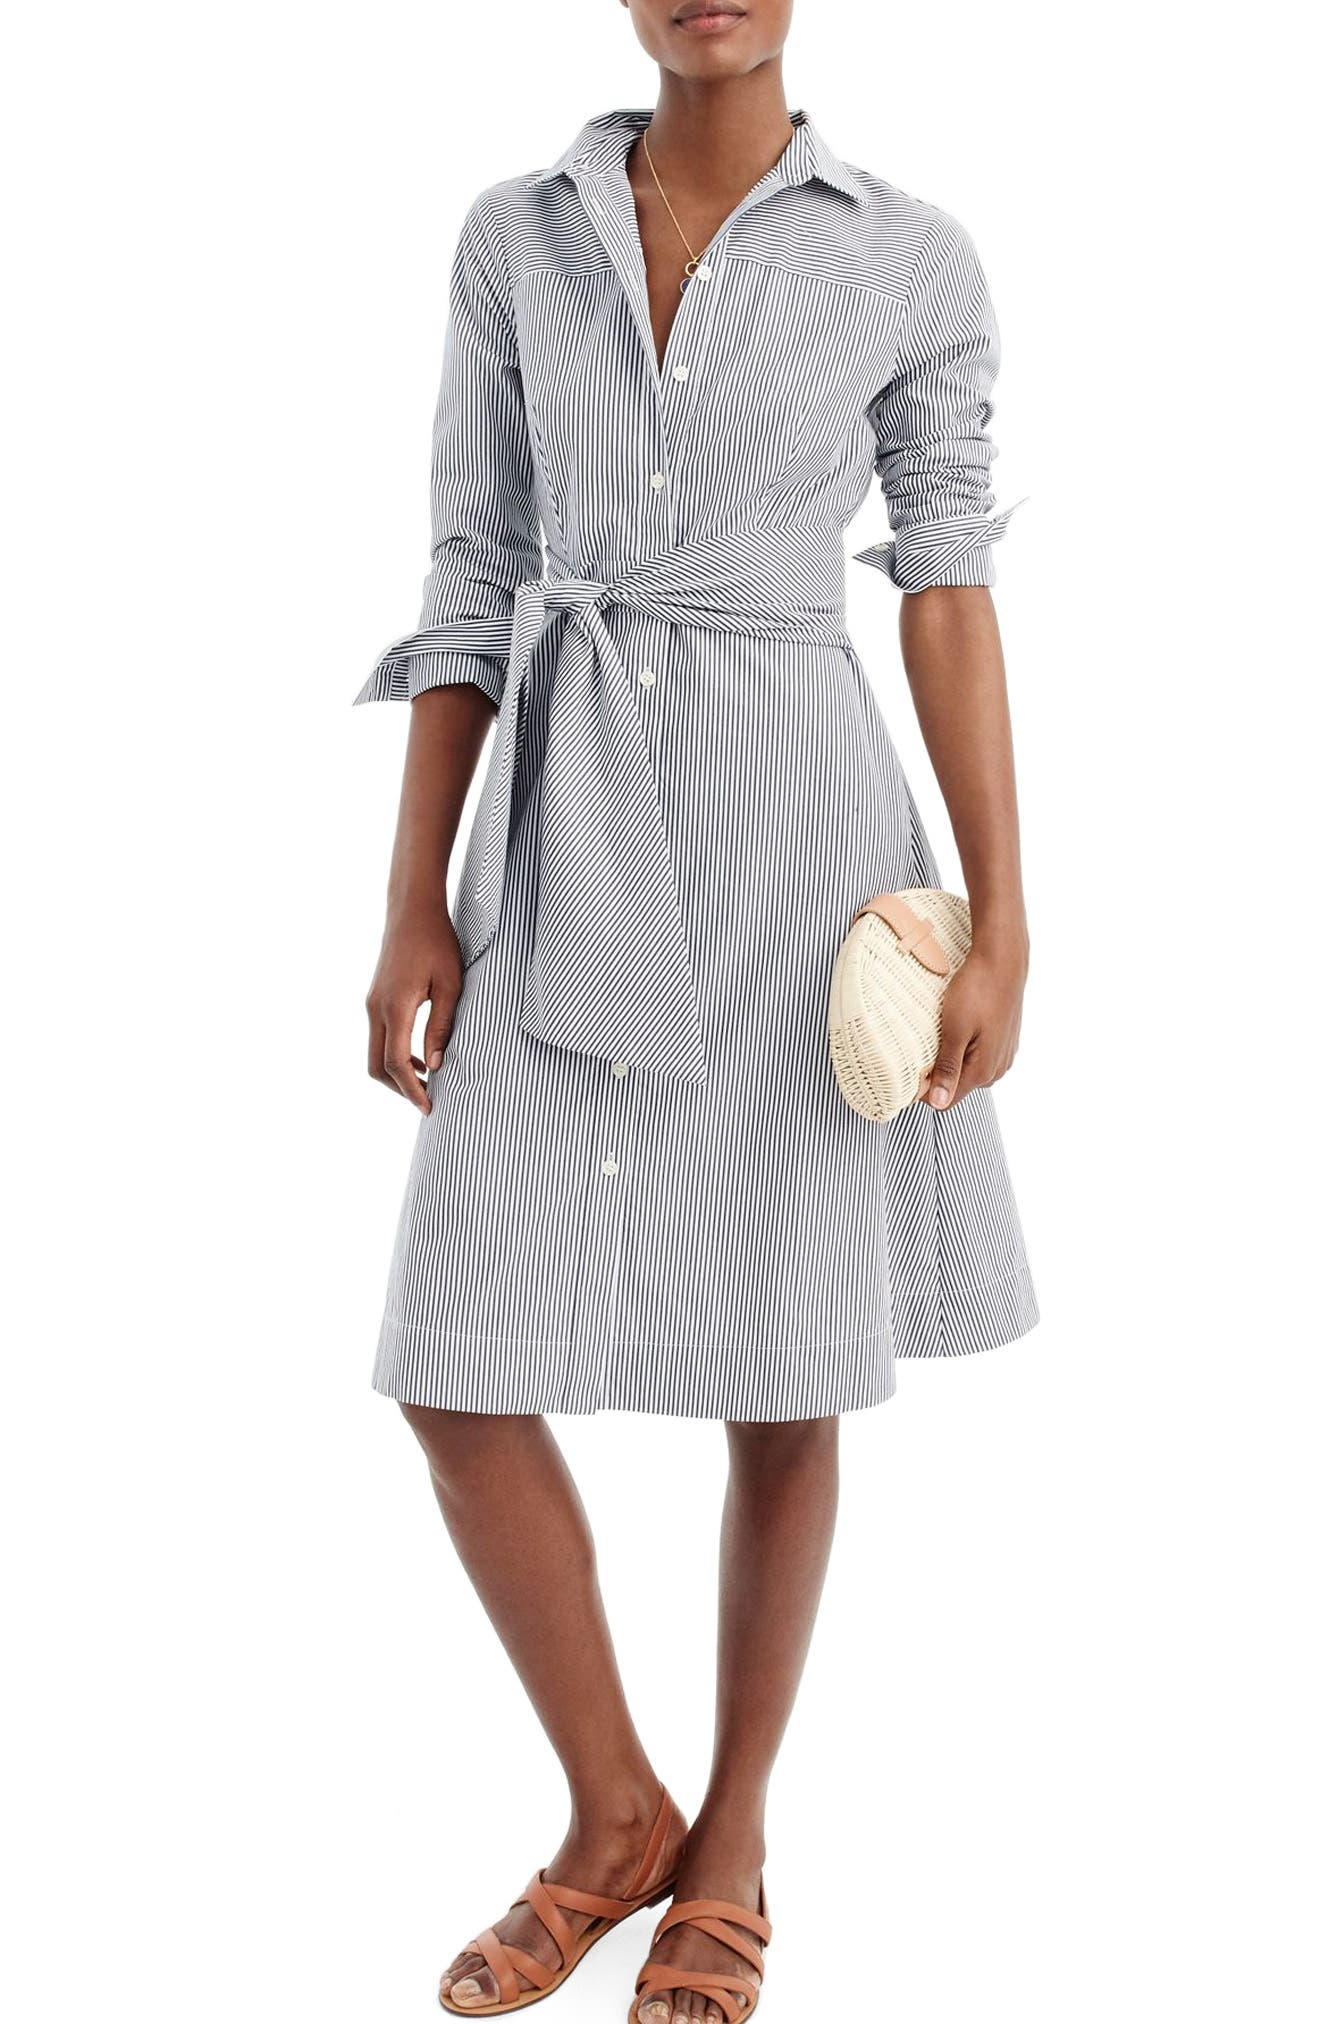 J.CREW, Stripe Tie-Waist Shirtdress, Main thumbnail 1, color, WHITE NAVY